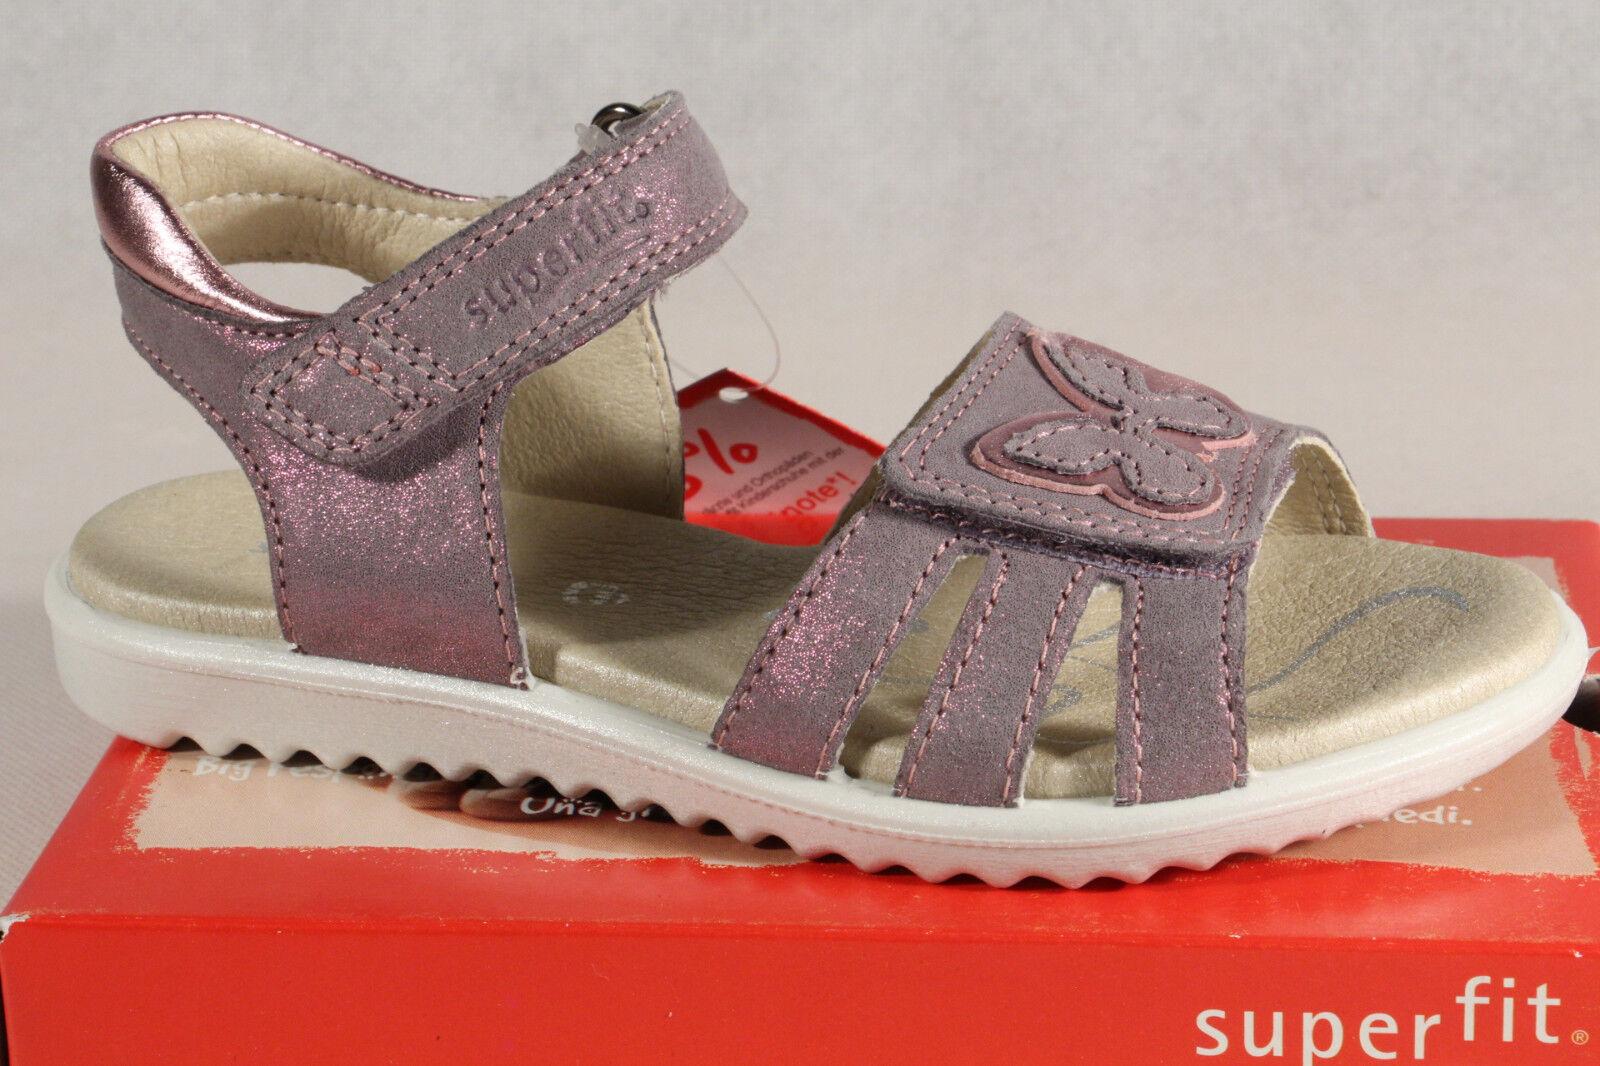 Superfit Mädchen Sandale Sandalette grau  lilat metallic Neu